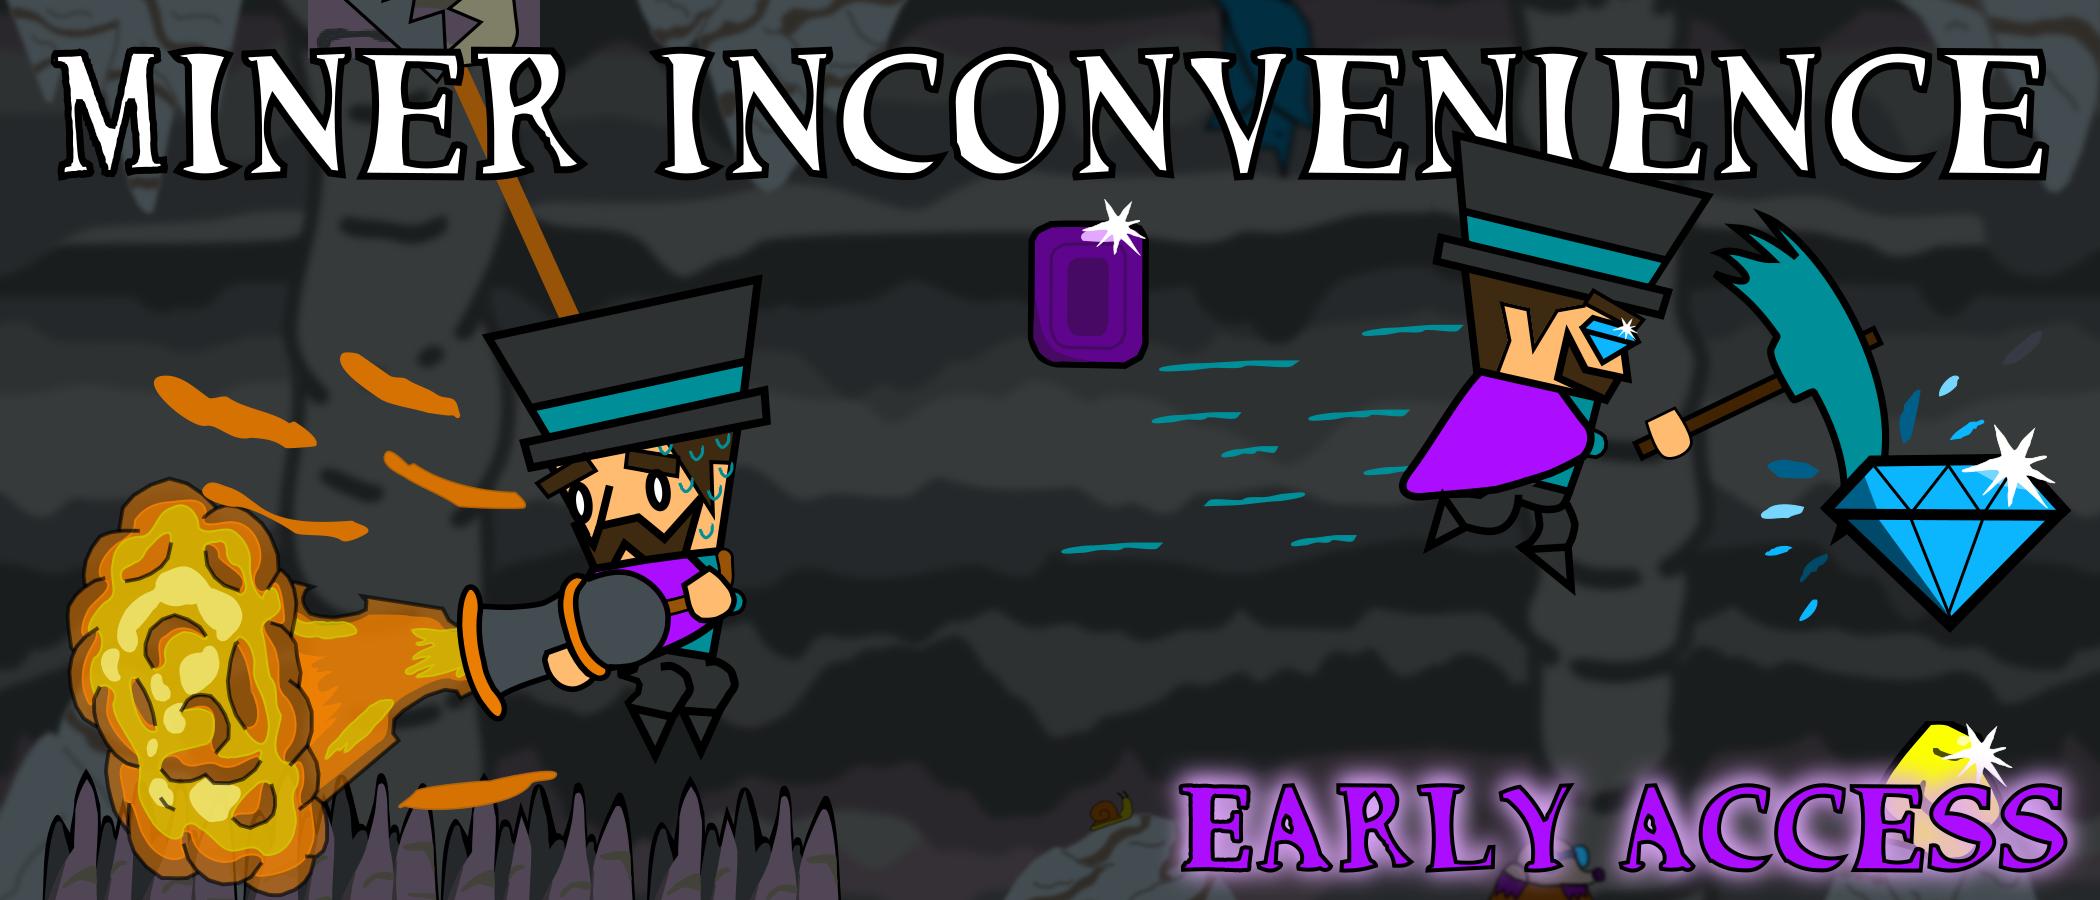 Miner Inconvenience